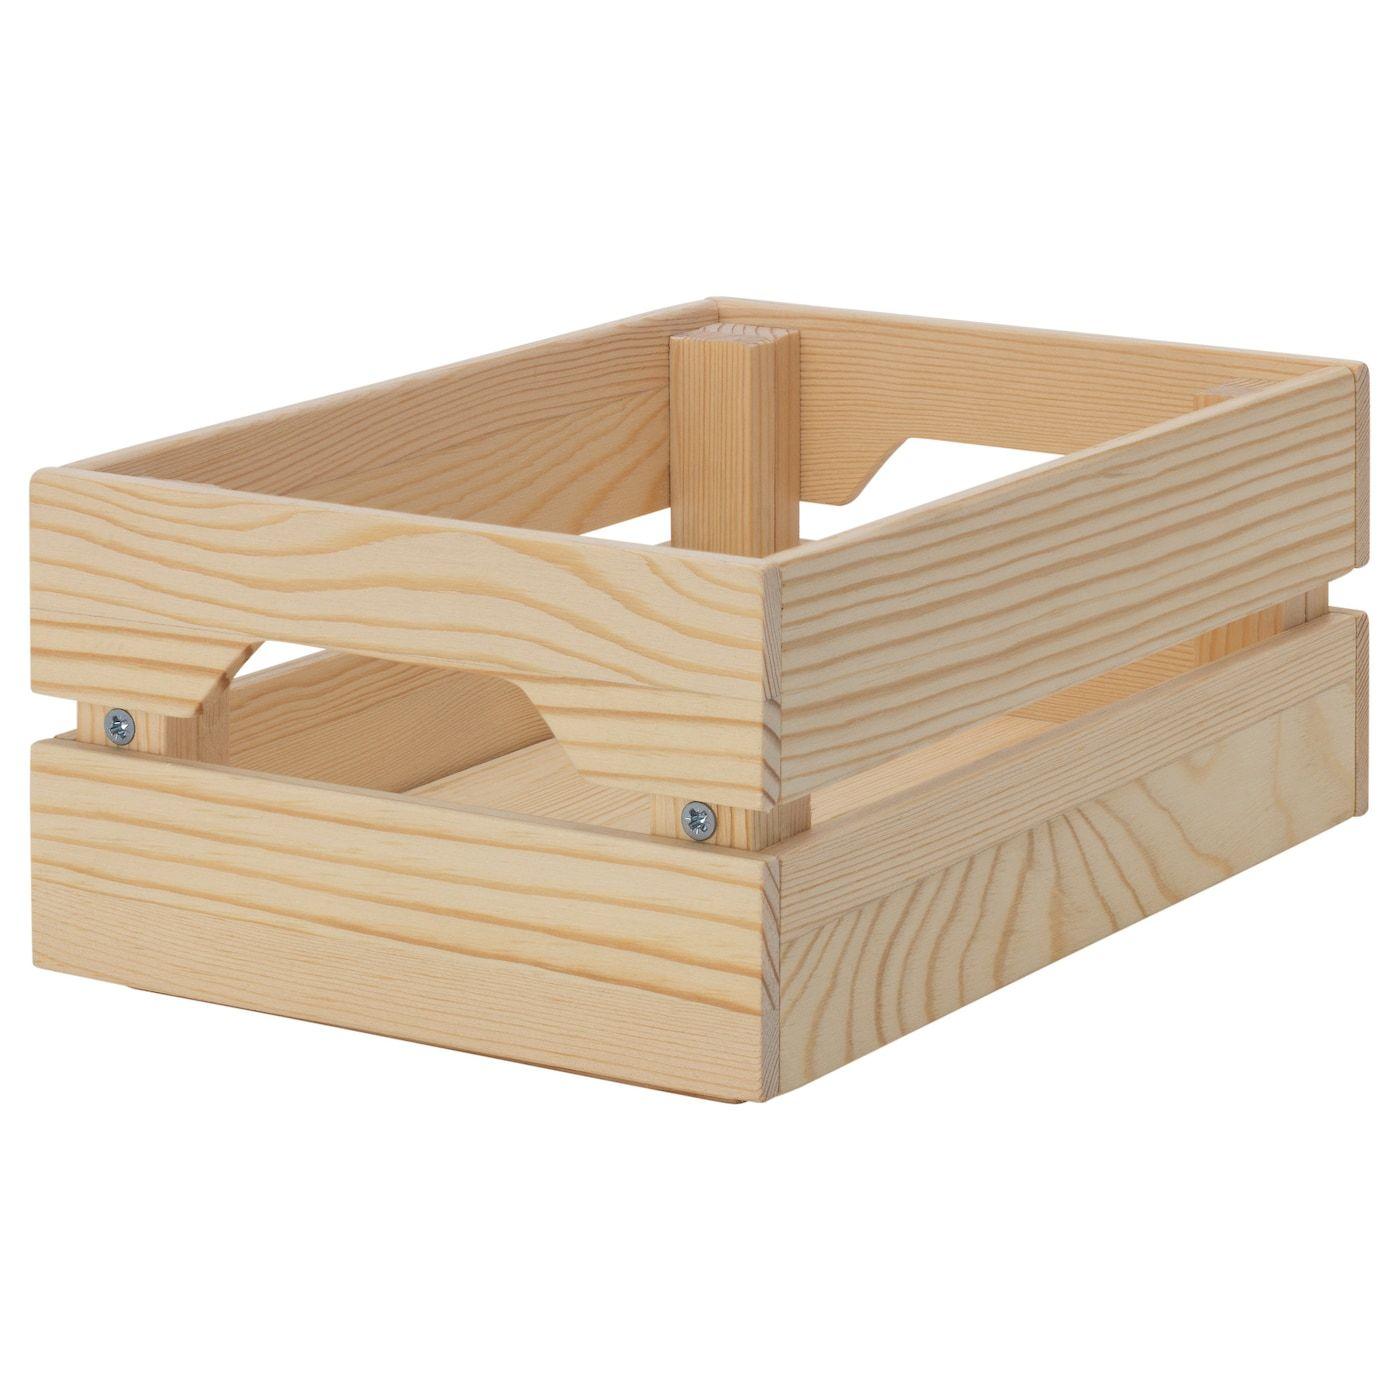 KNAGGLIG Boîte, pin - IKEA | Boite de rangement, Panier ikea, Ikea